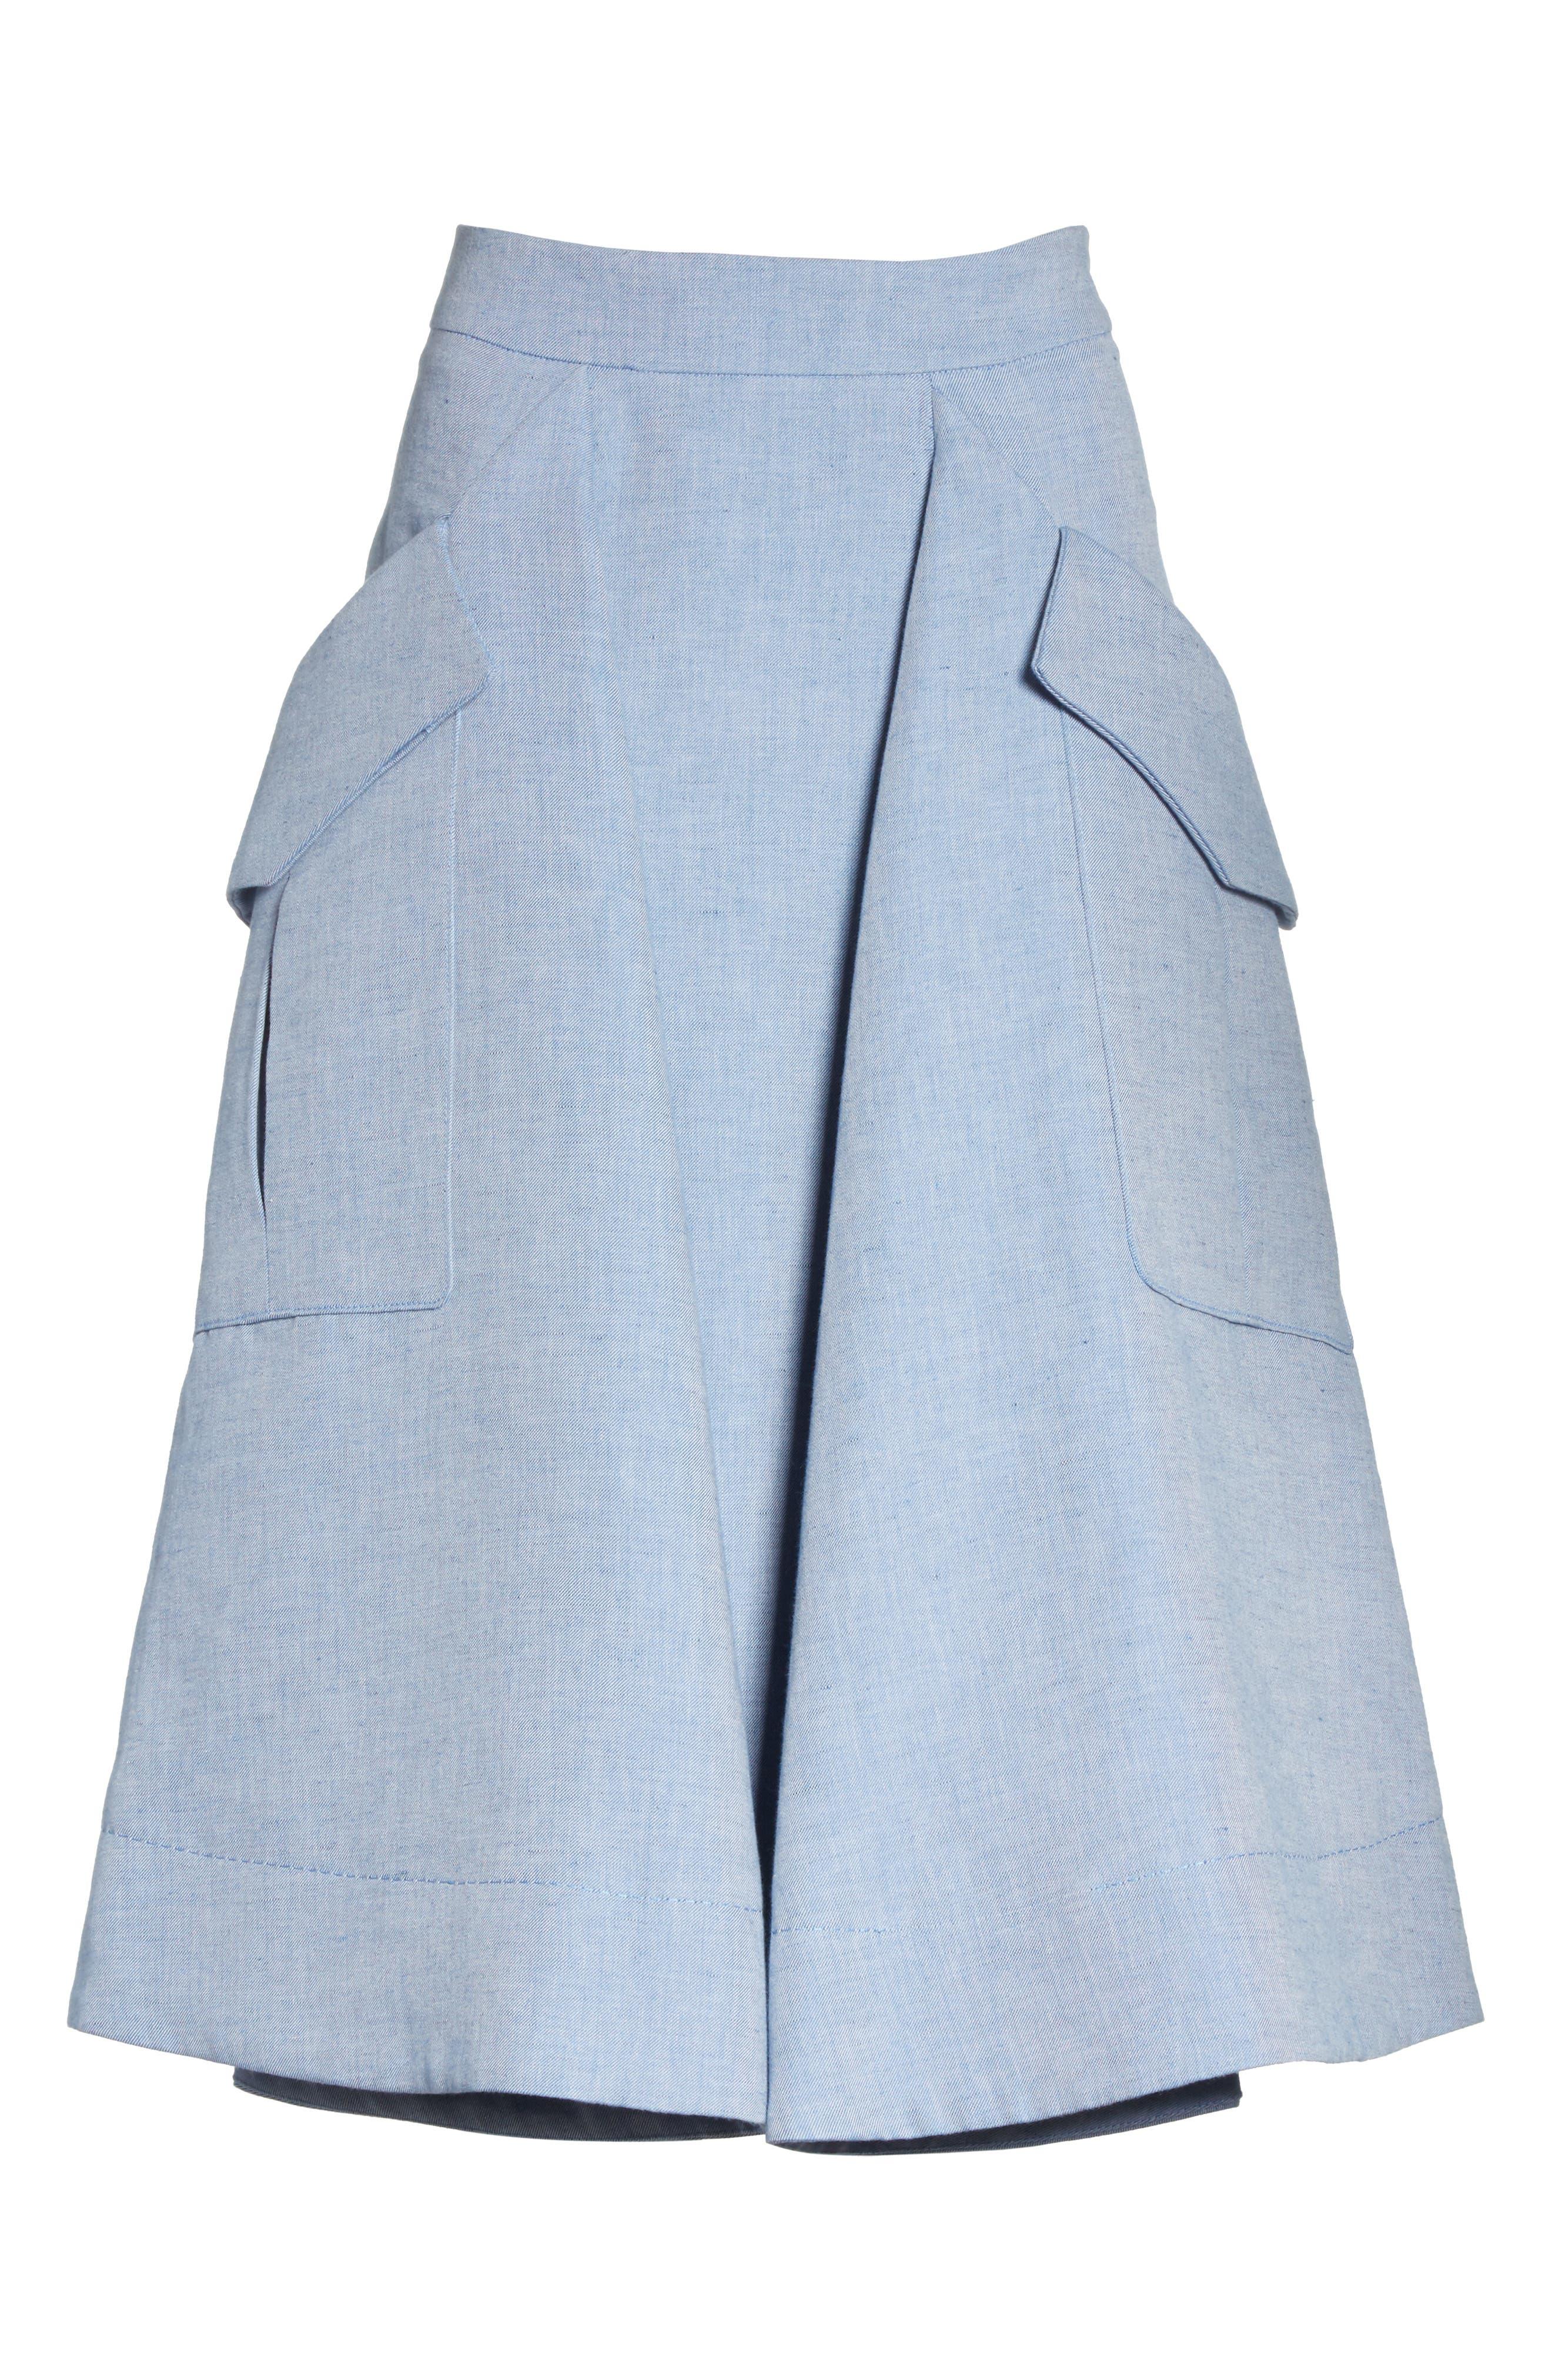 Jupe Genou Skirt,                             Alternate thumbnail 6, color,                             400